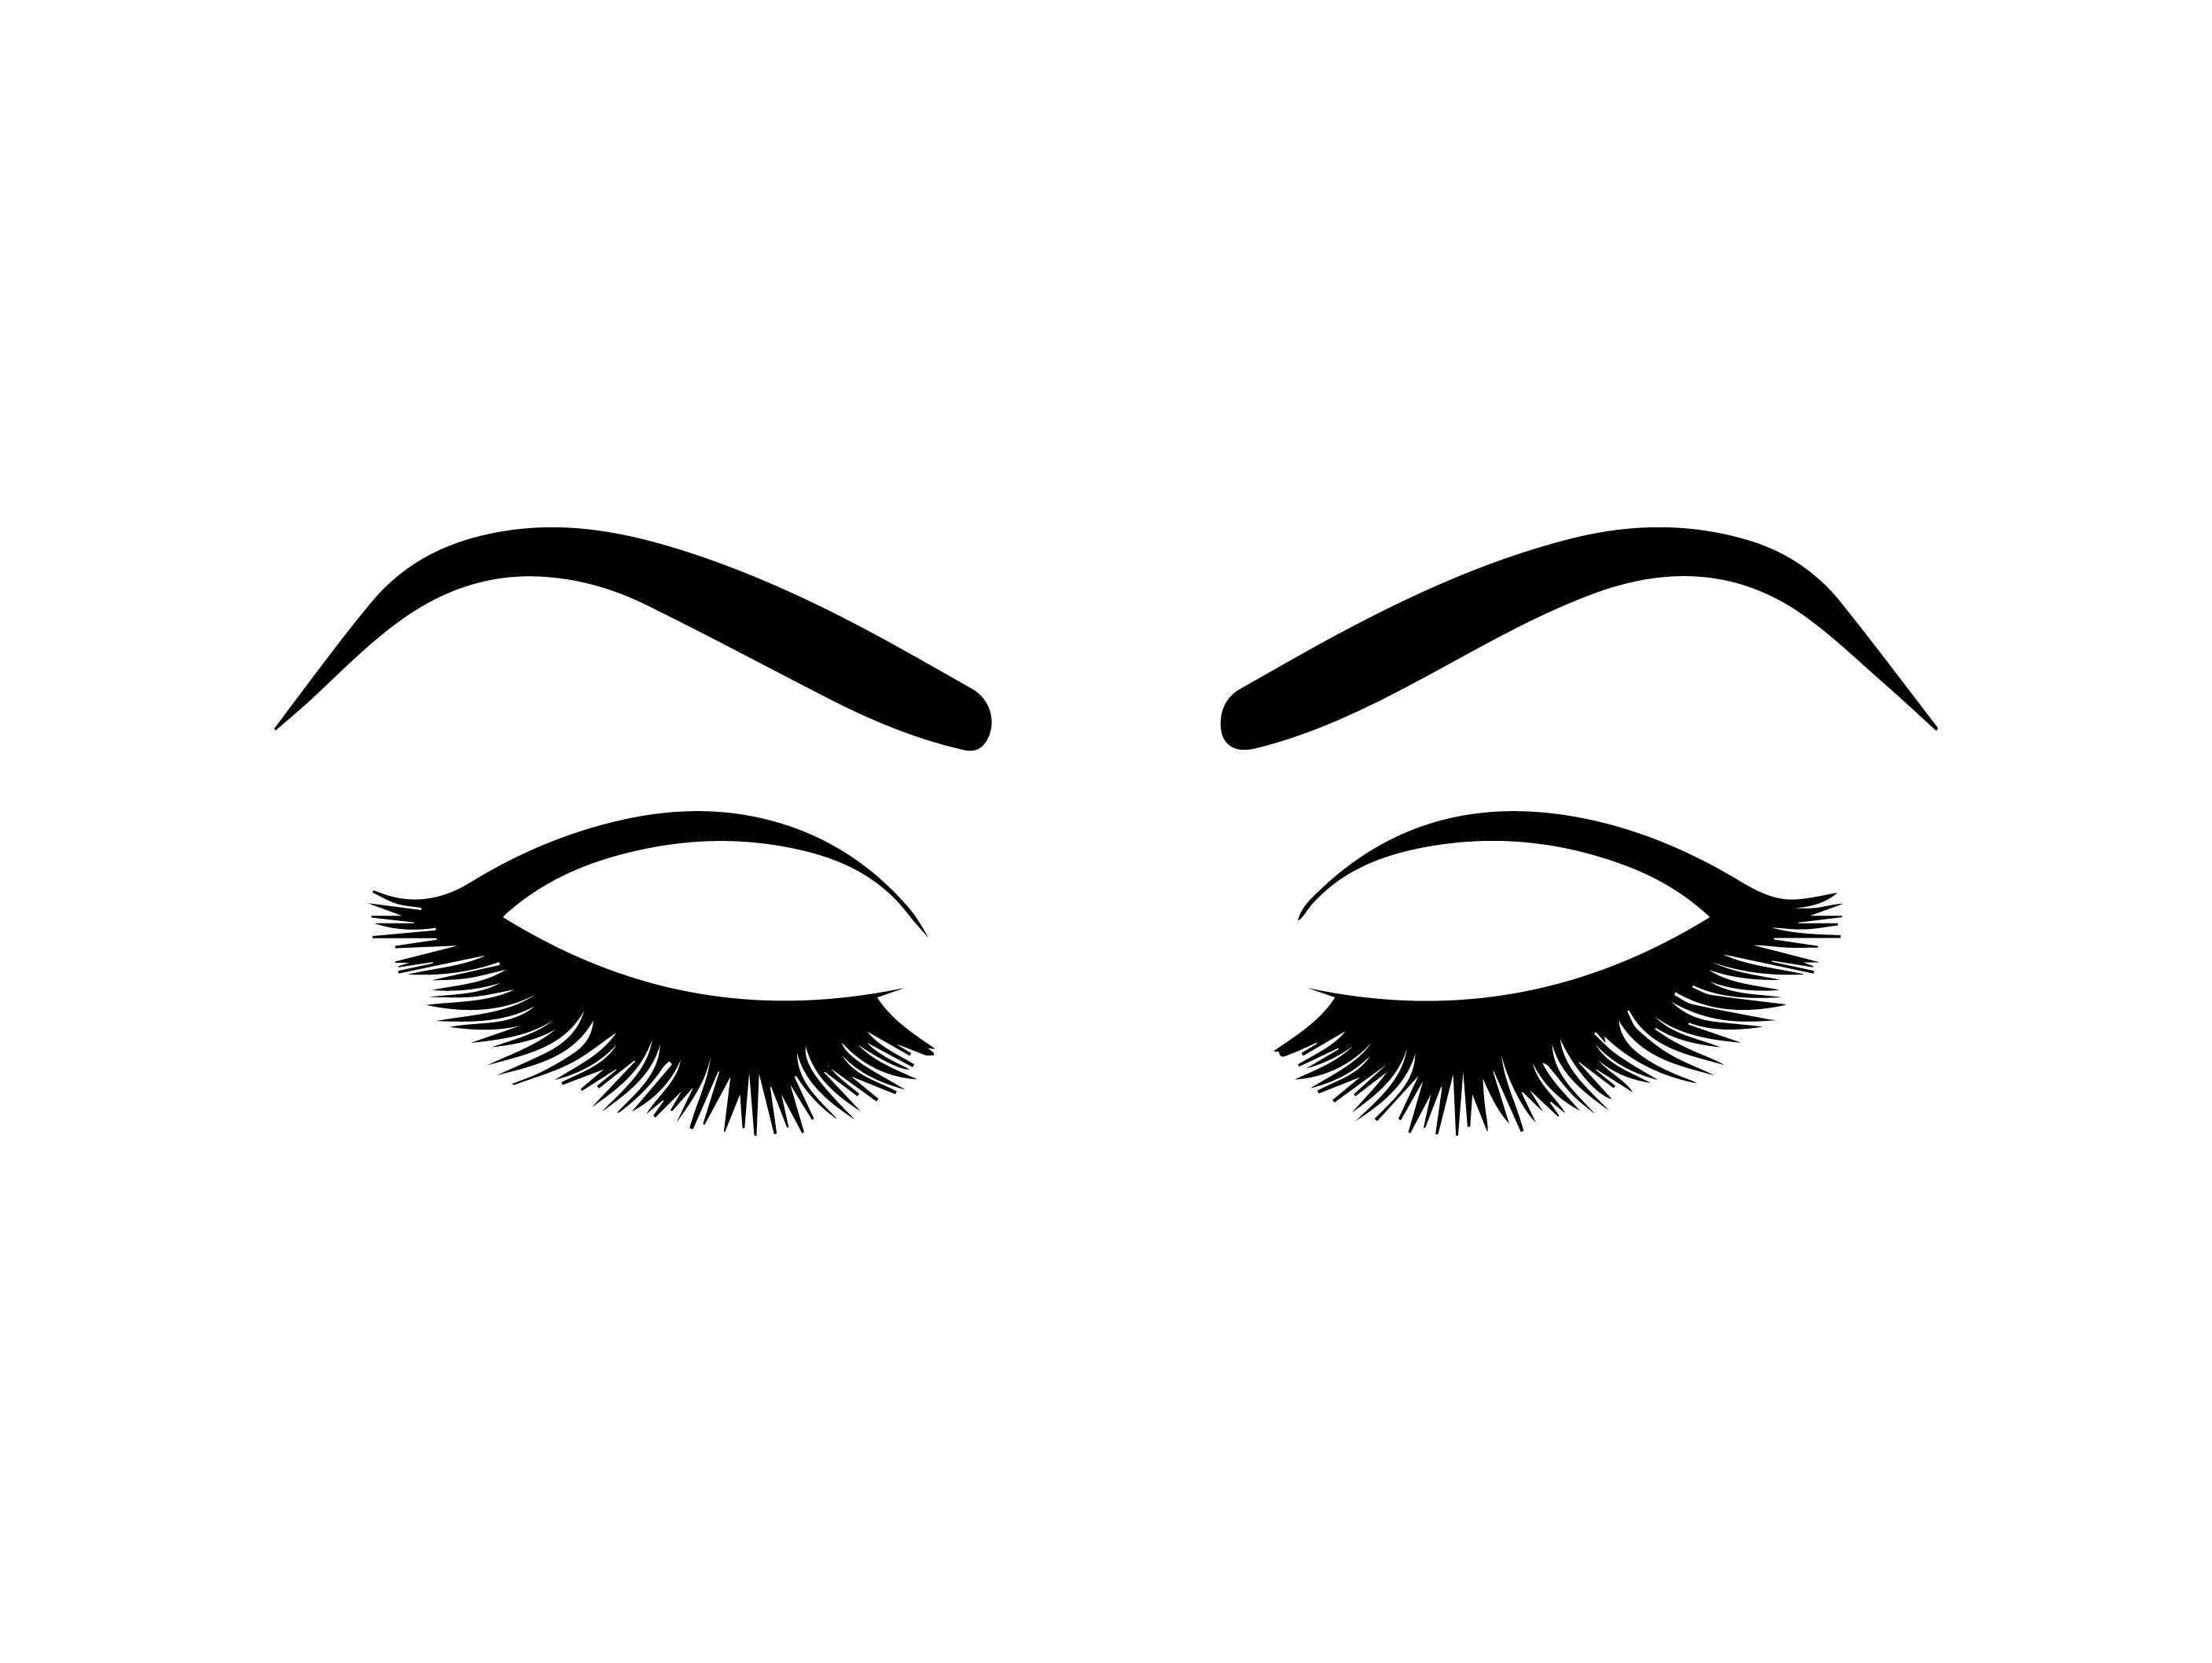 Eyebrow Eyelashes Vision Human Female Ojos Sign Eyeball See